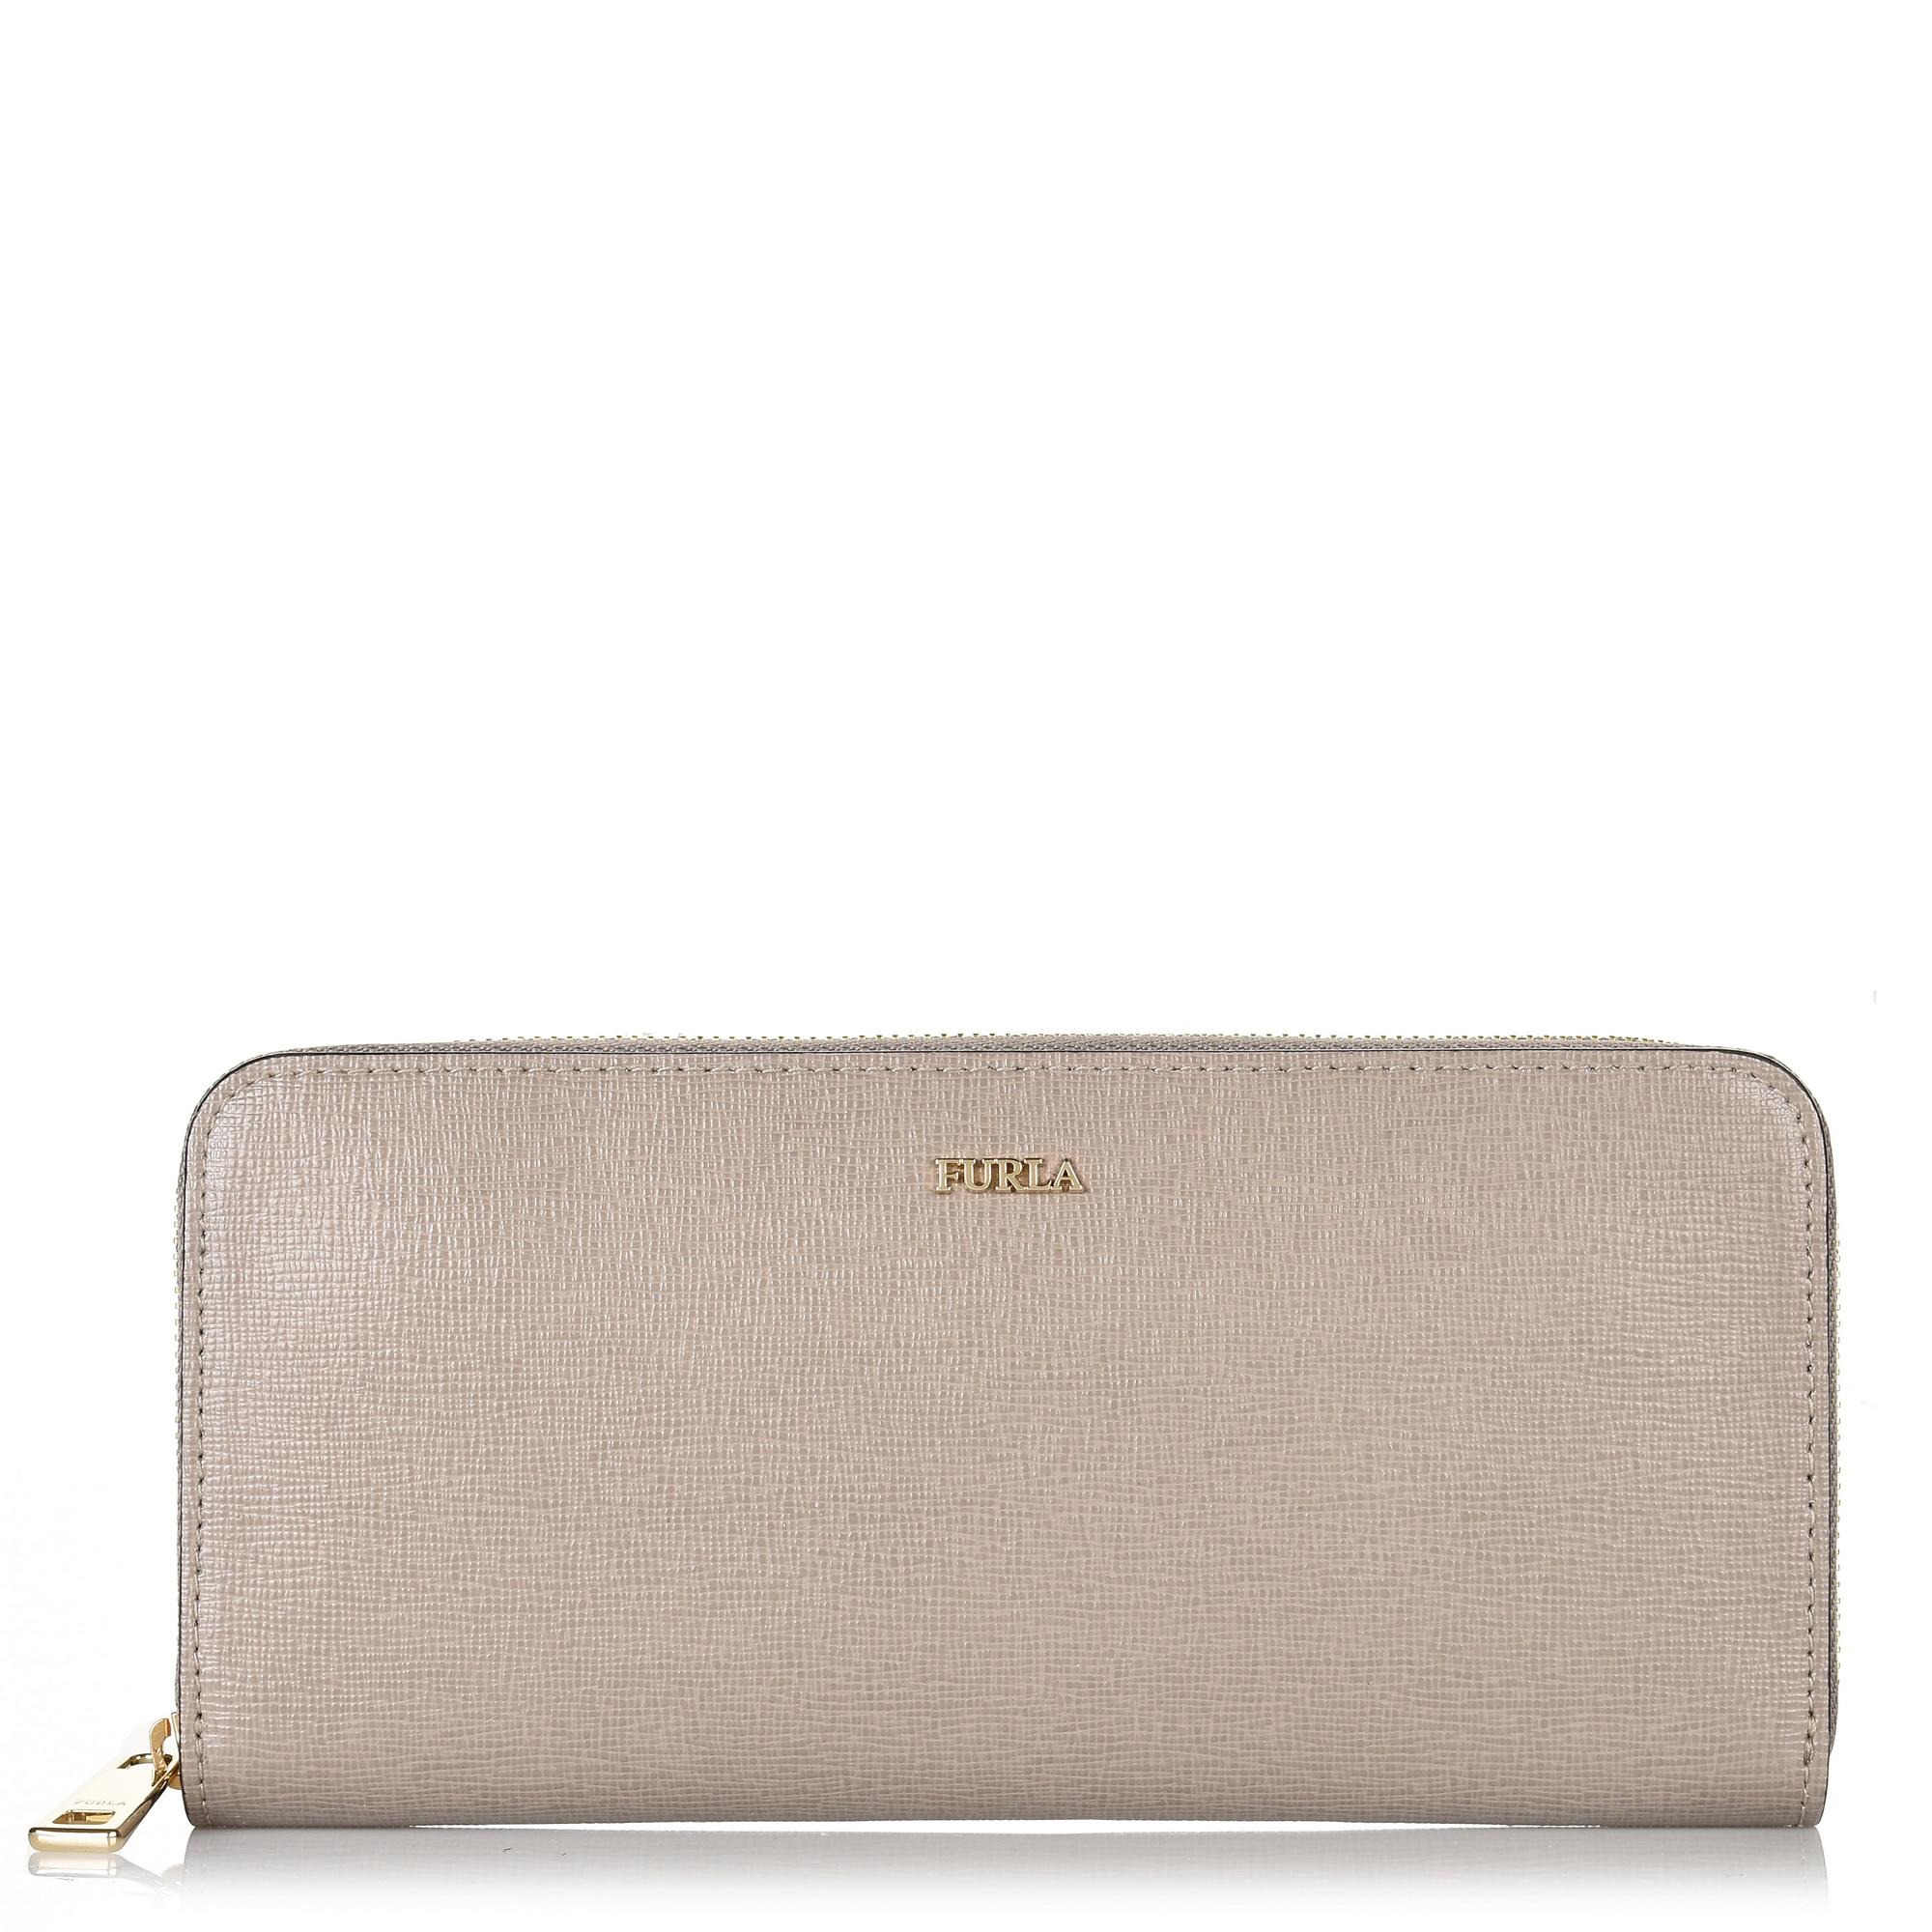 1420d0e8a0 Brand Bags Δερμάτινο Πορτοφόλι Κασετίνα Furla 010068